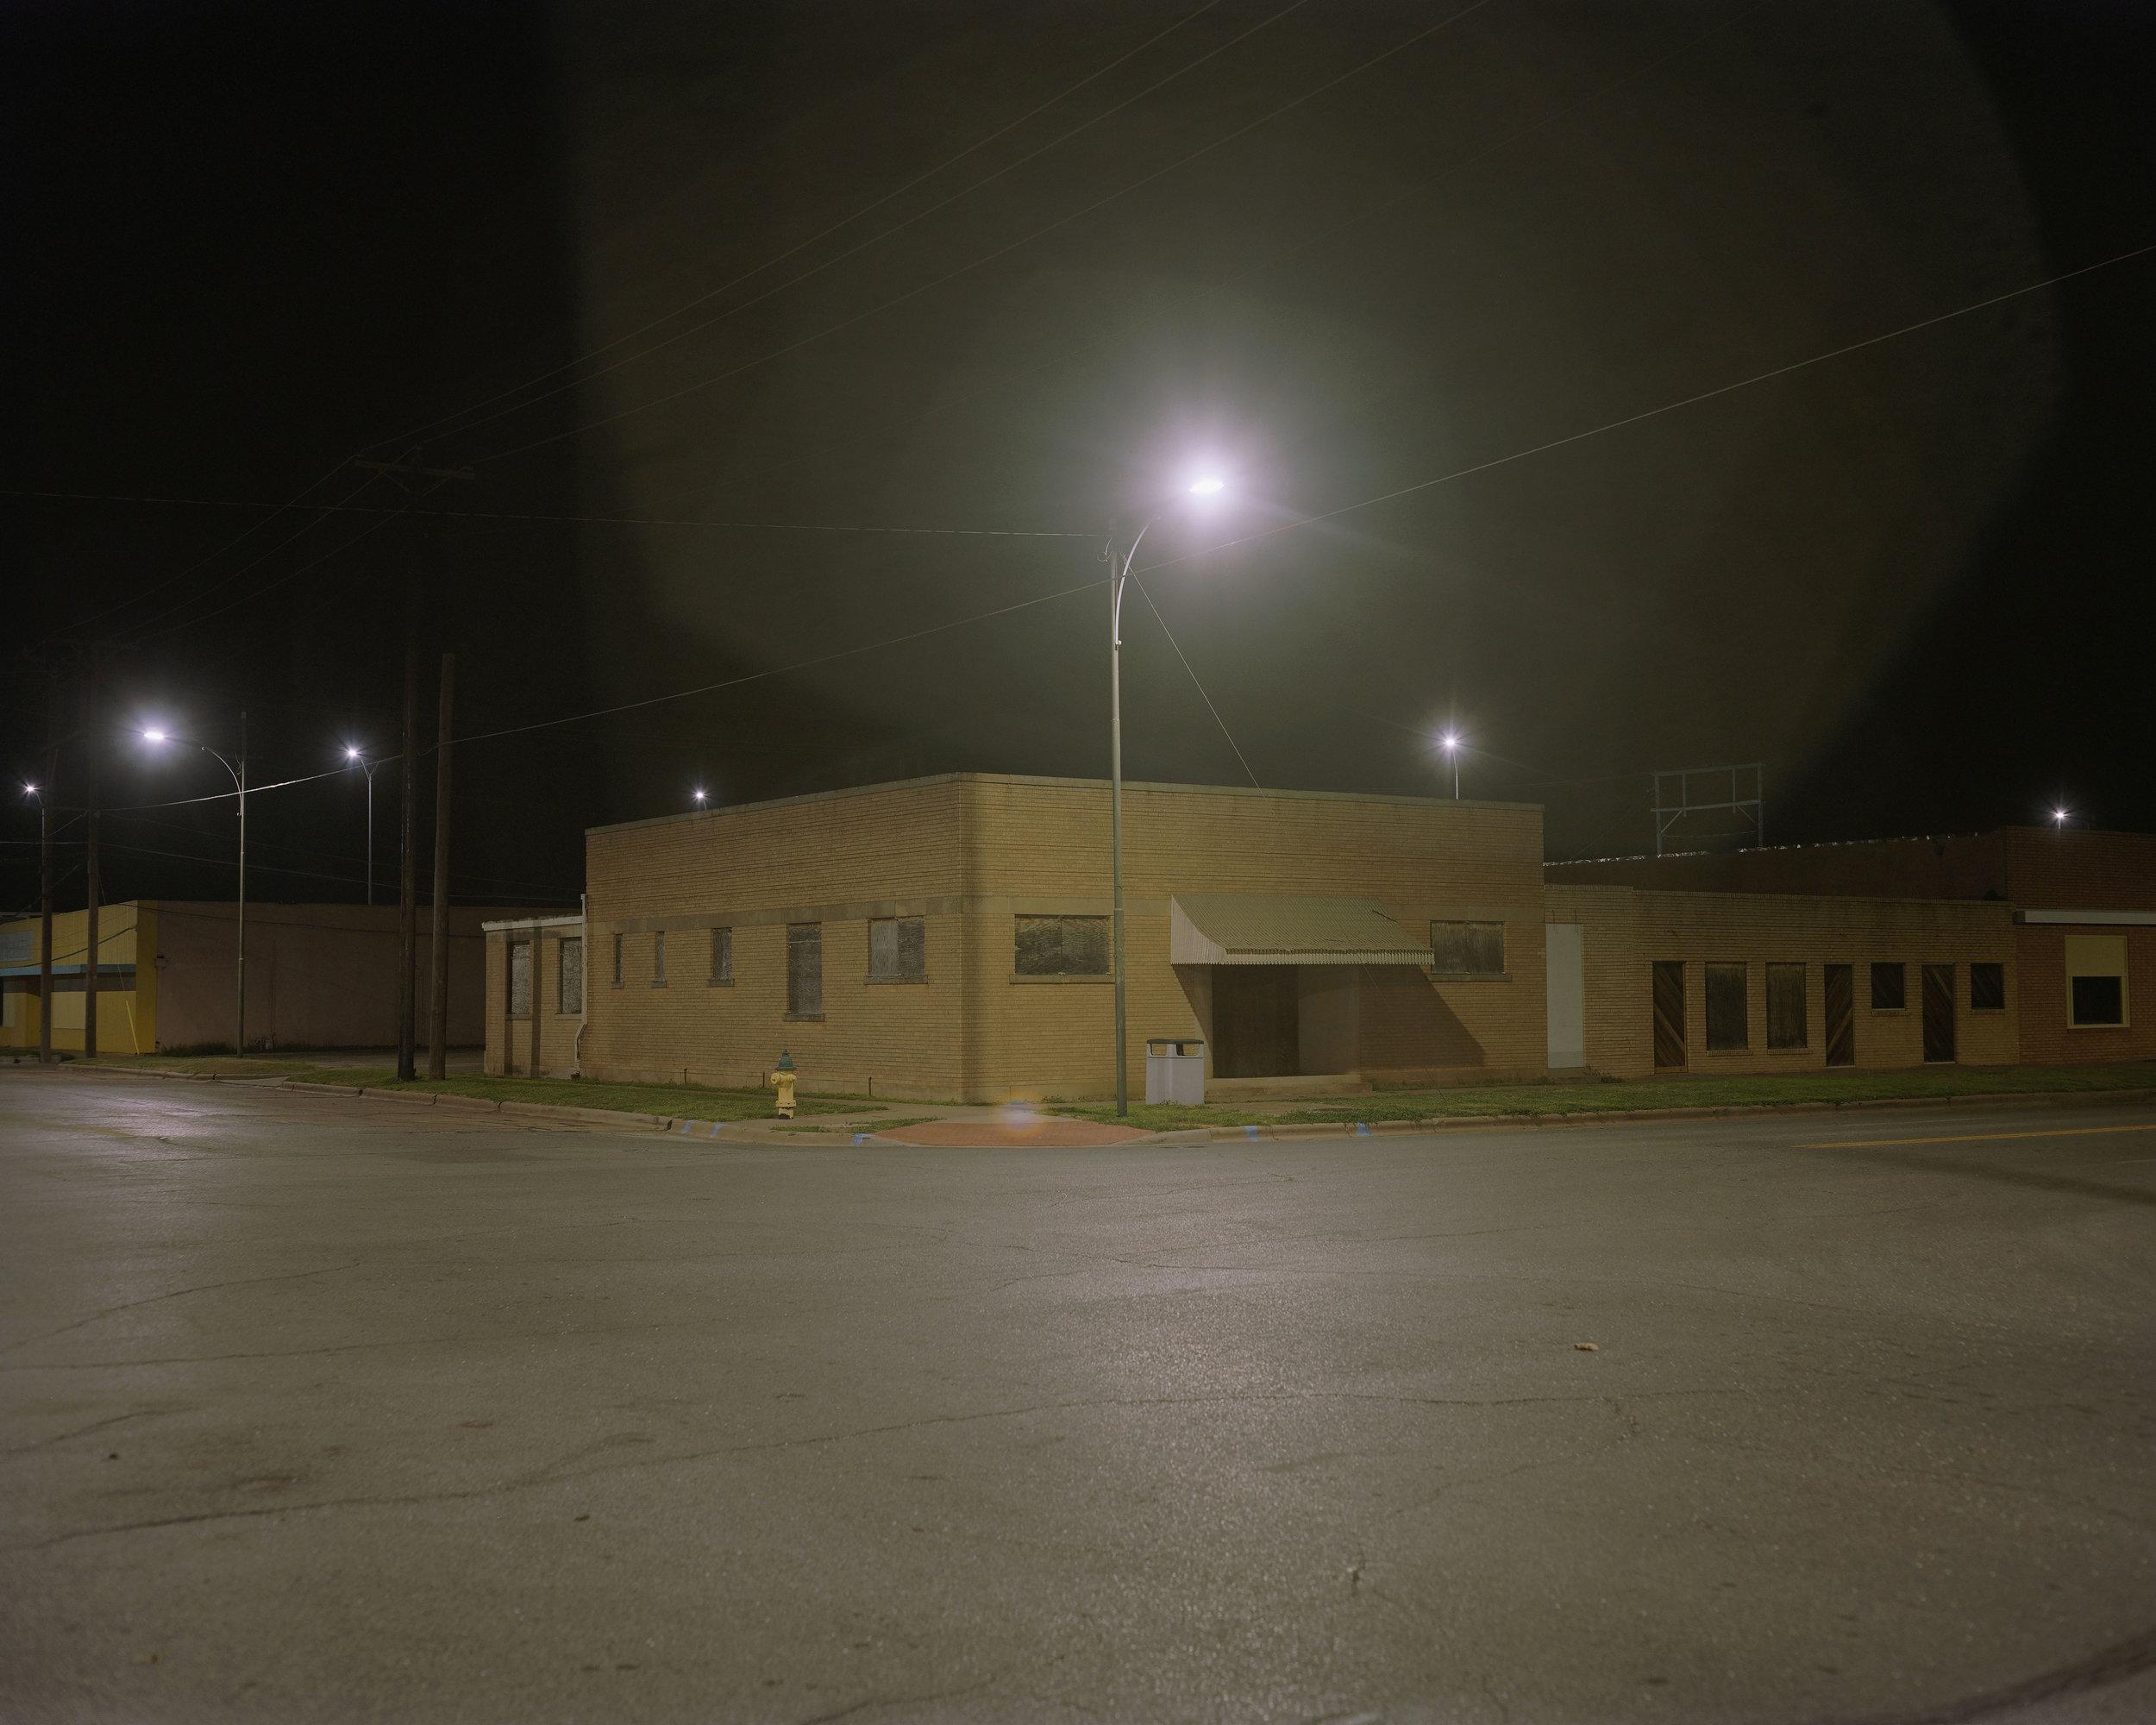 39.WichitaFalls2.jpg